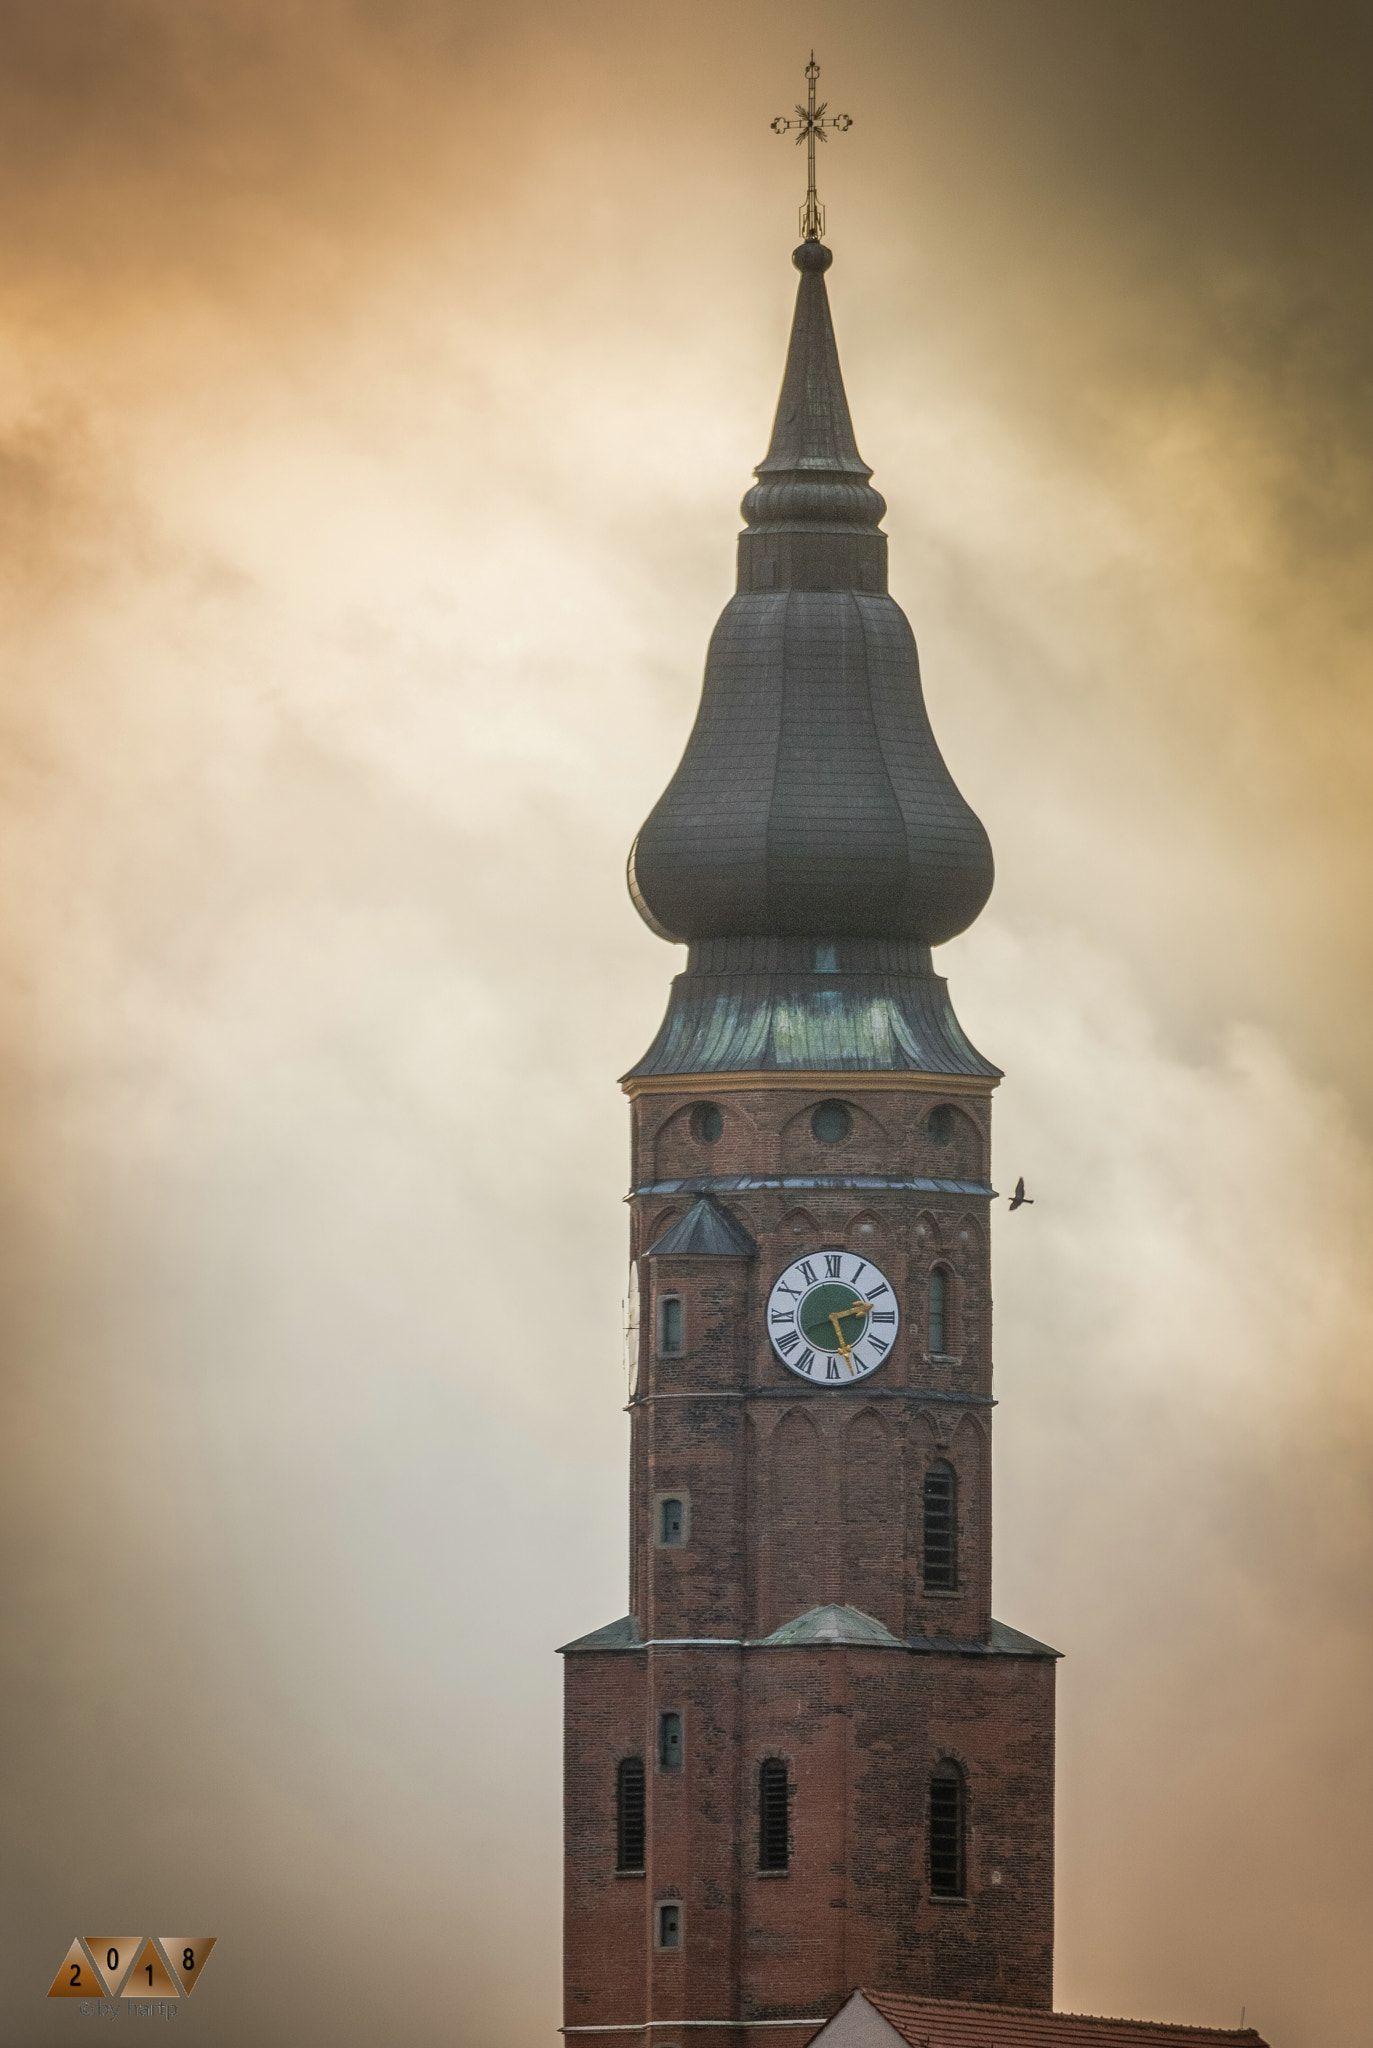 Gewaltig Der Turm Der Basilika St Jakob In Straubing Turm